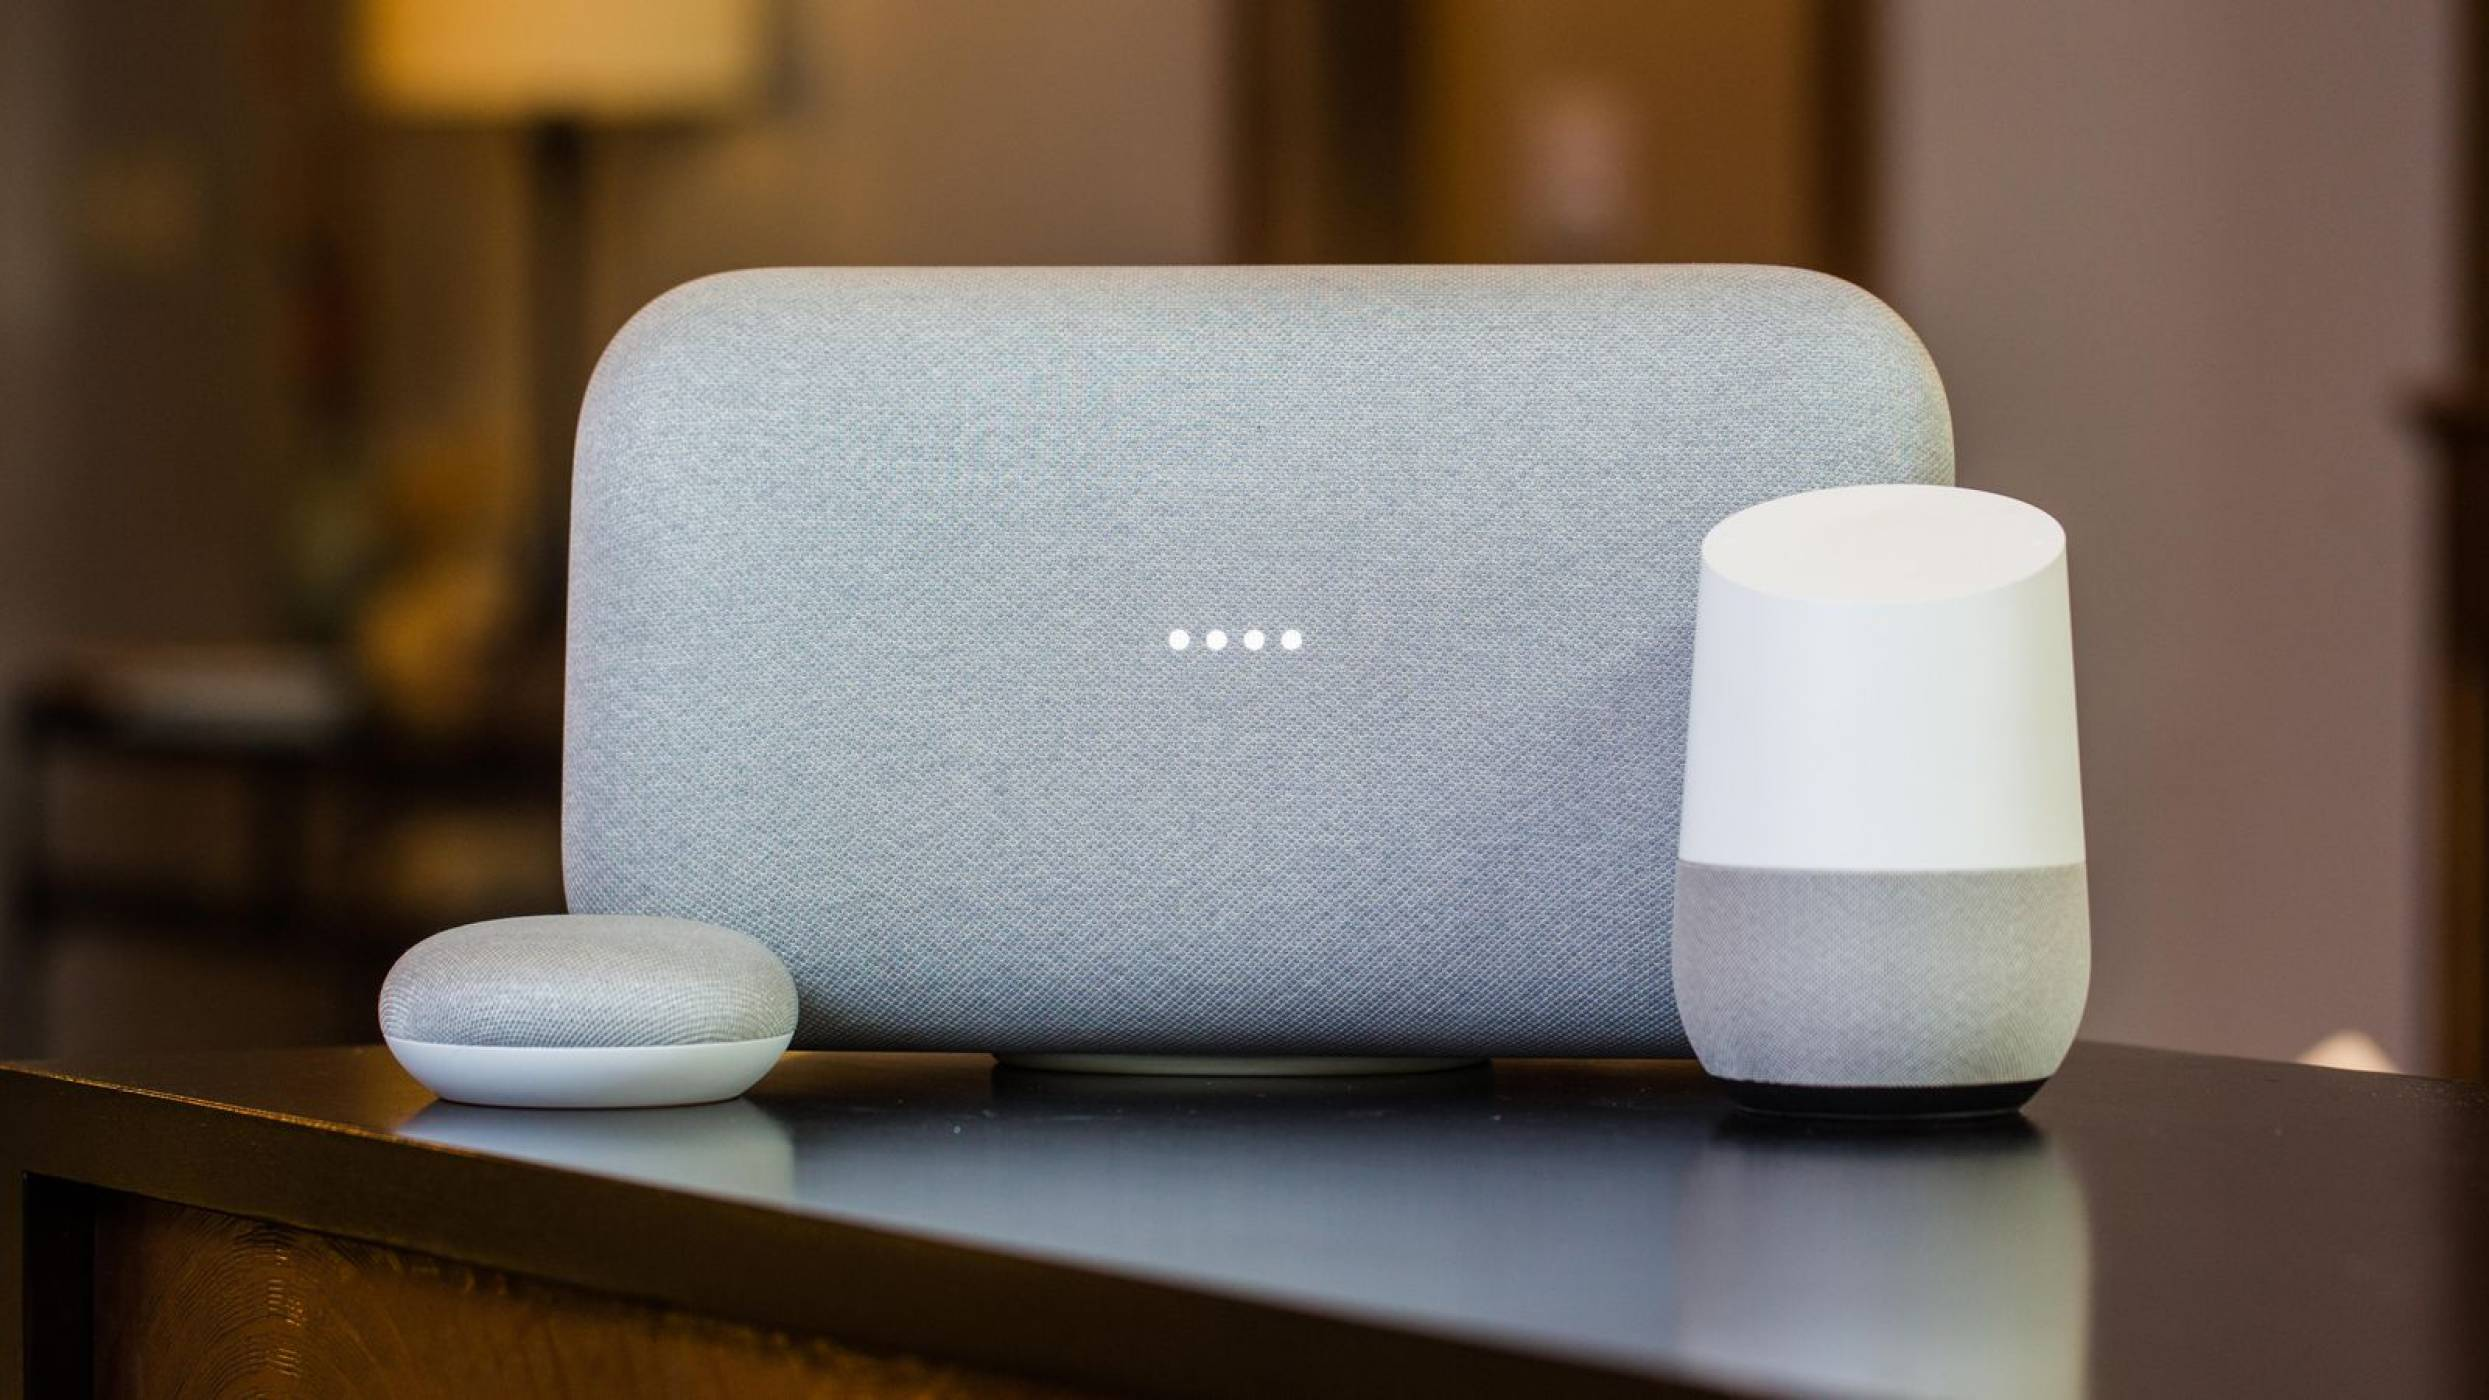 Google Assistant едноличен победител в тест за интелигентност при домашните асистенти